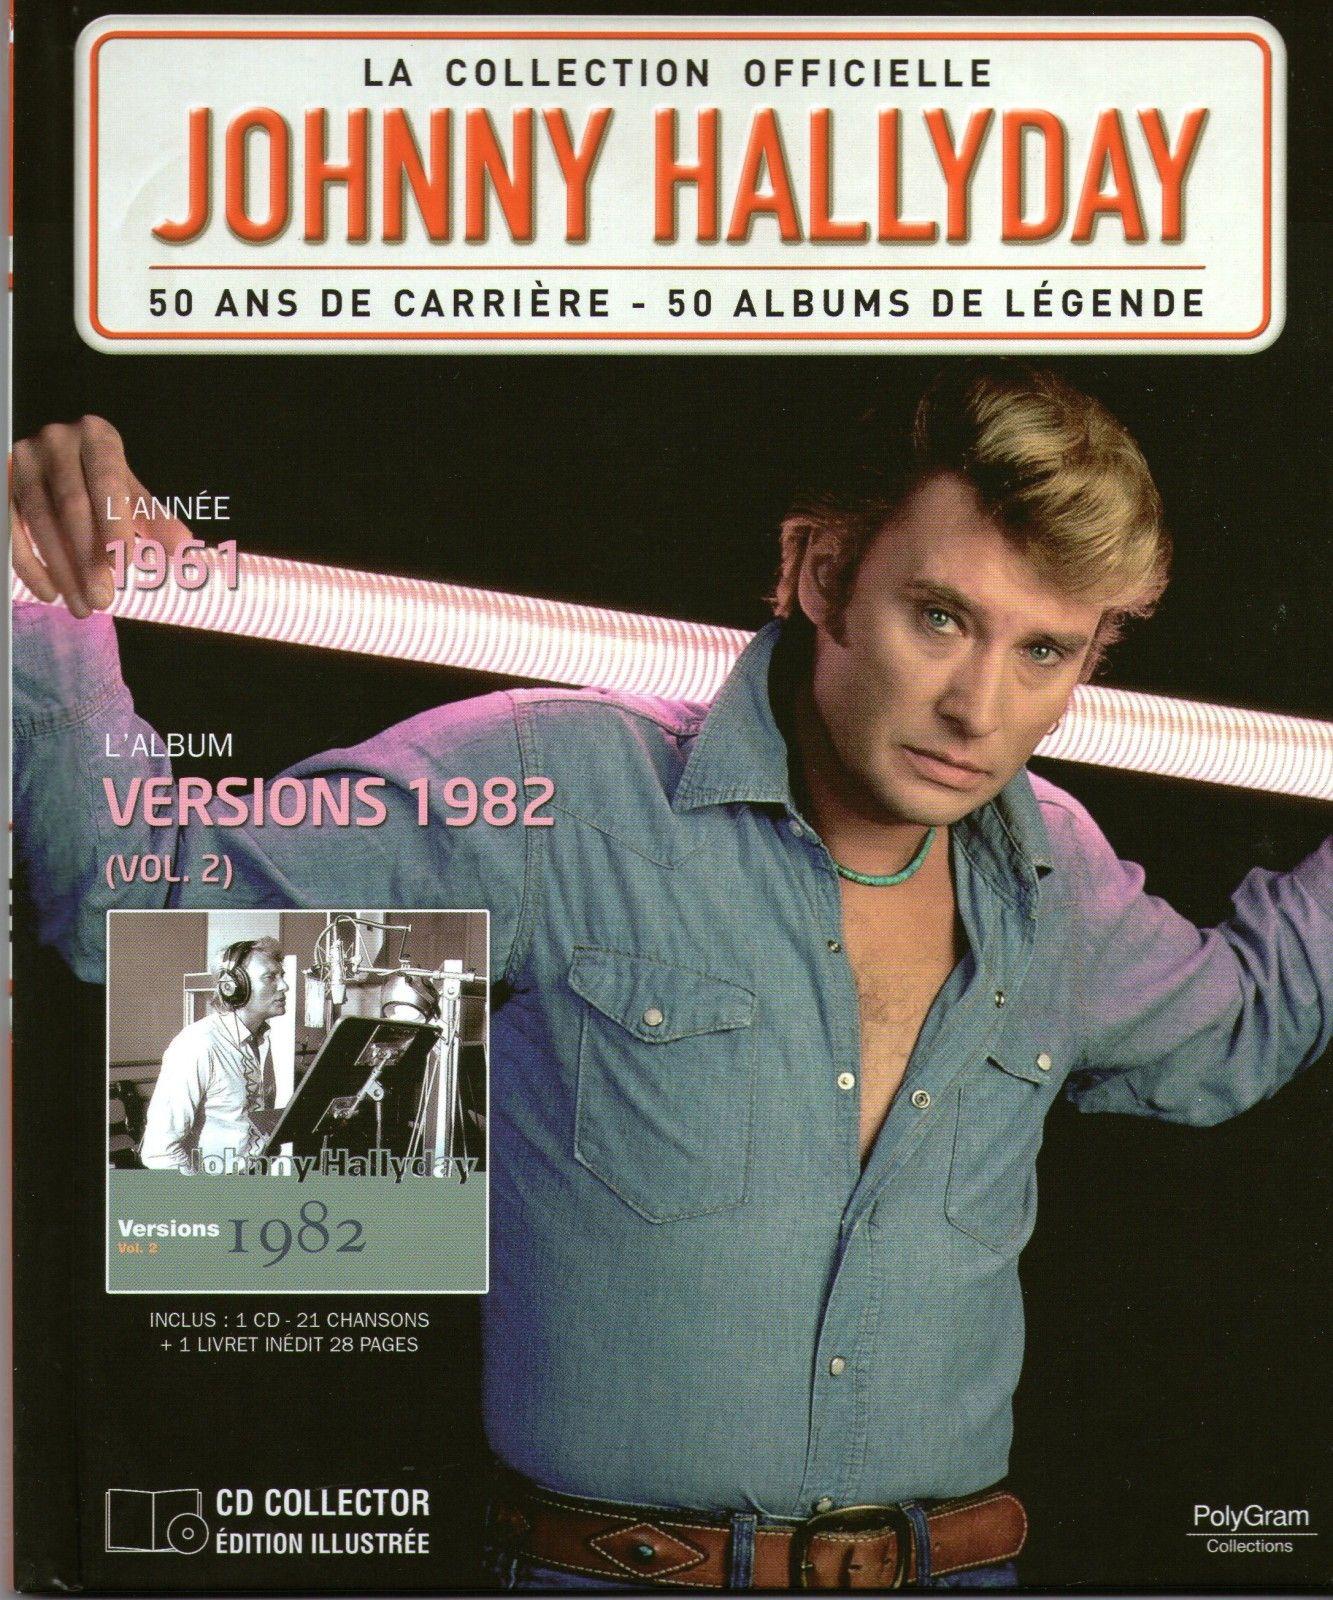 la collection officielle johnny hallyday 50 ans de carri re 50 albums de l gende johnny. Black Bedroom Furniture Sets. Home Design Ideas